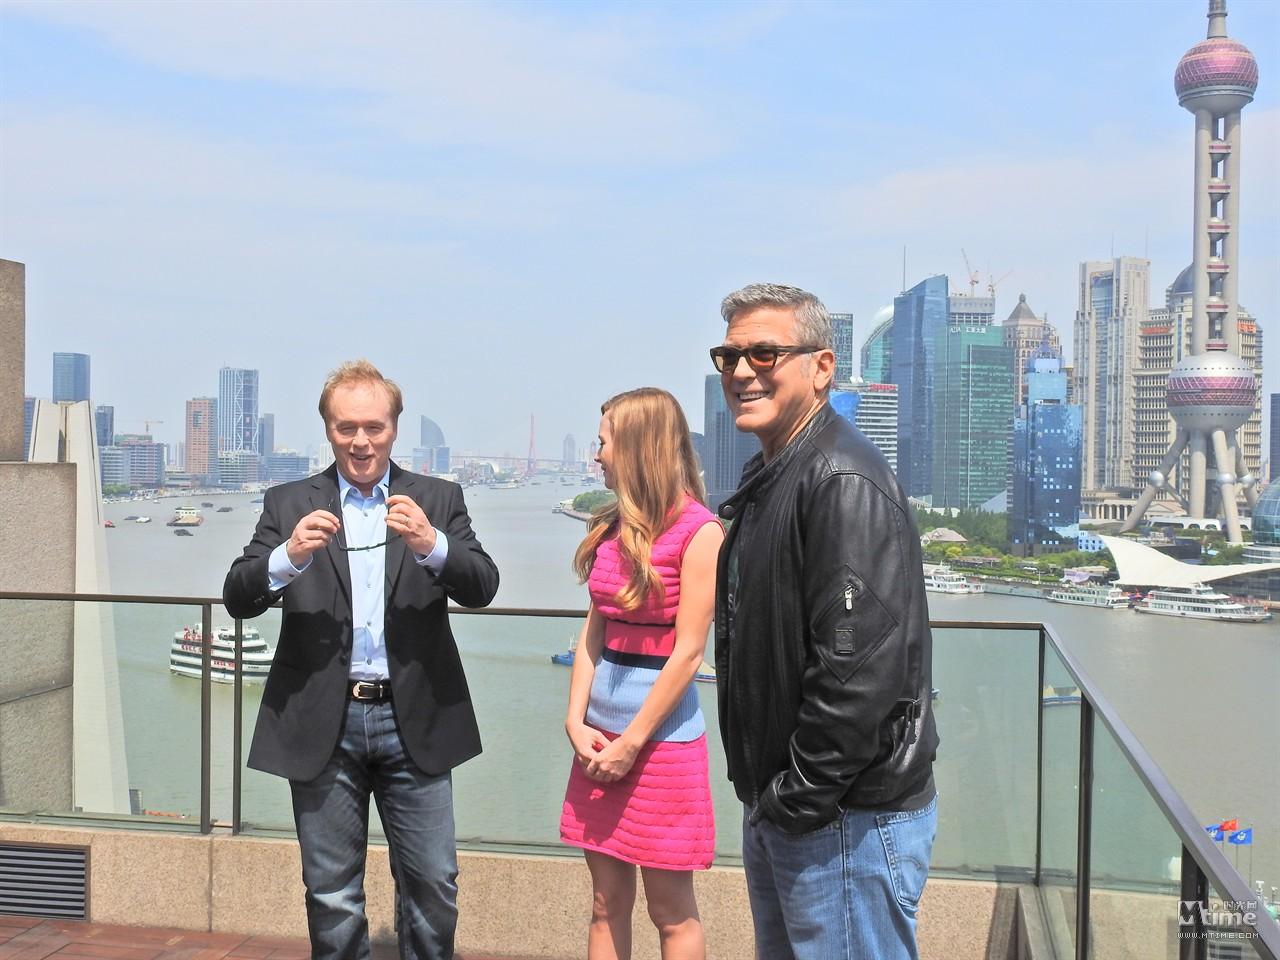 George Clooney in Shanghai Tomorrowland Premier 22. May 2015 004628.92039613_1280